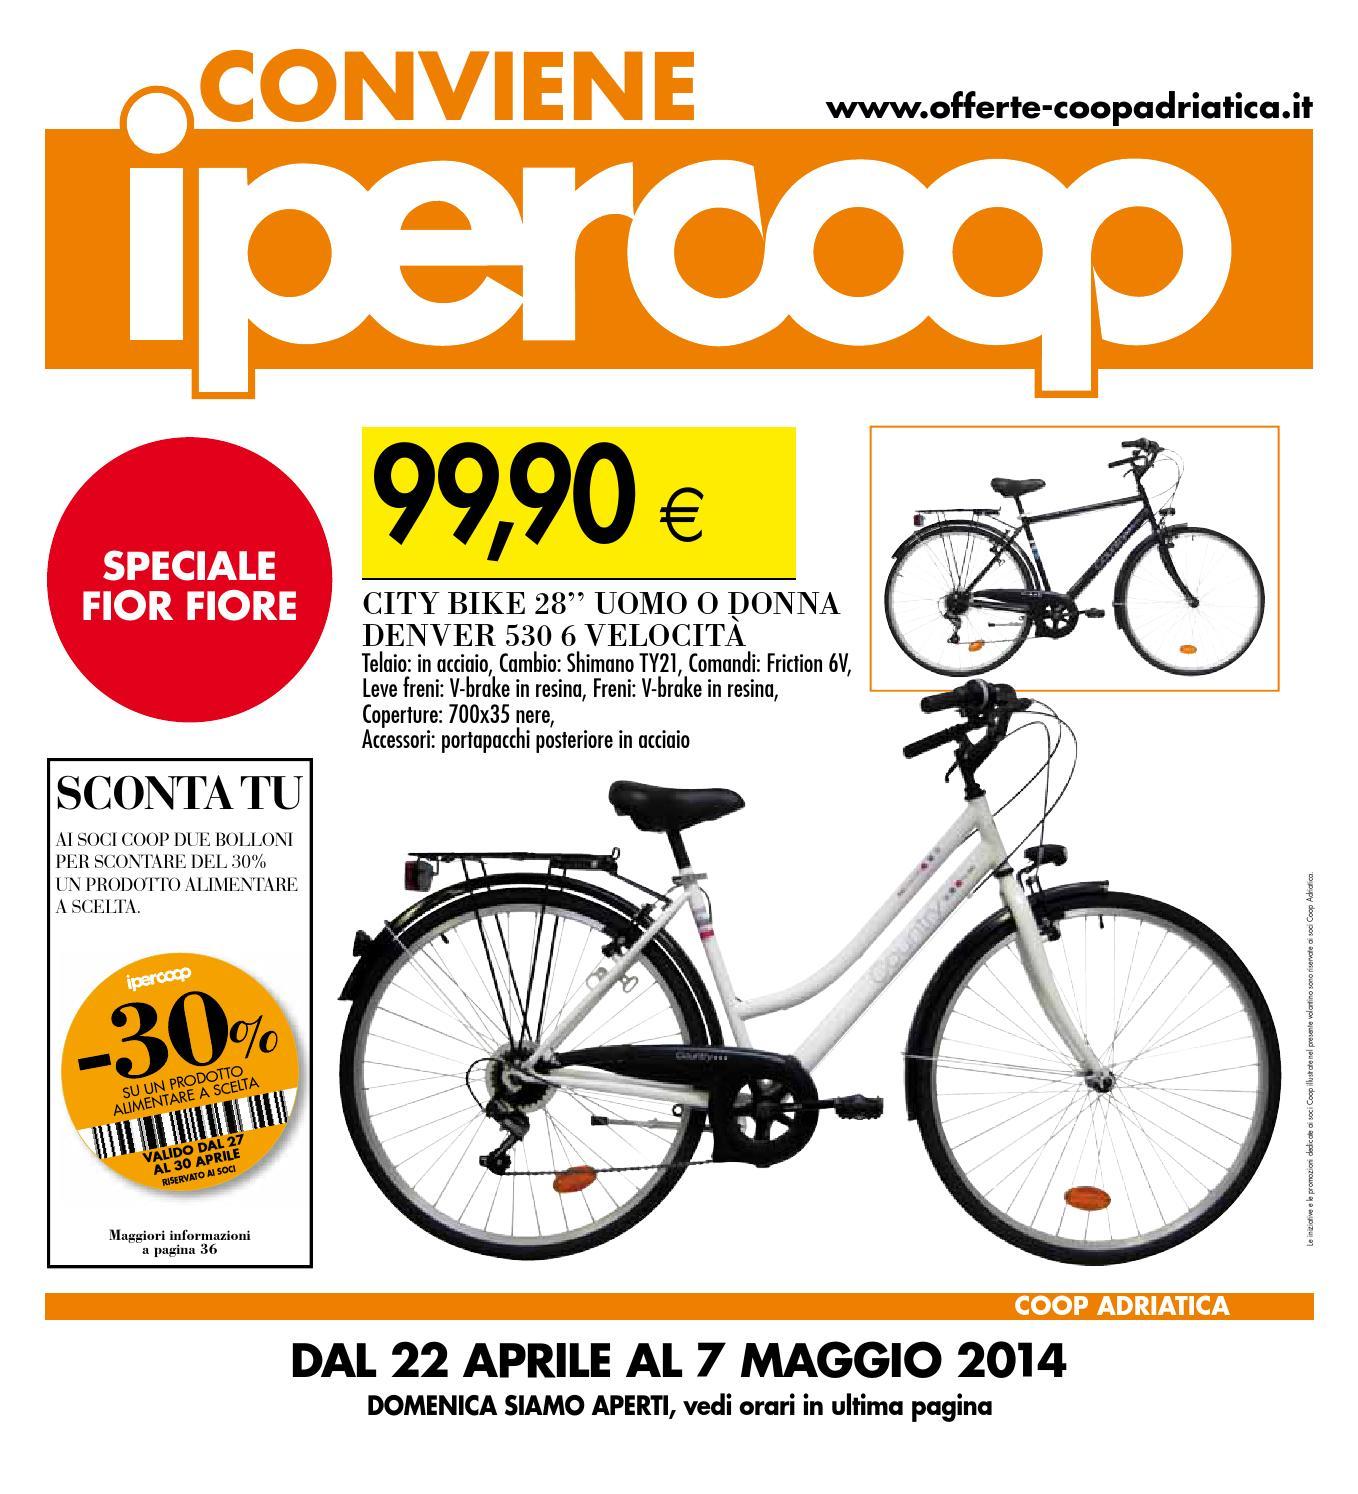 Bicicletta Offerta Volantino Ipercoop